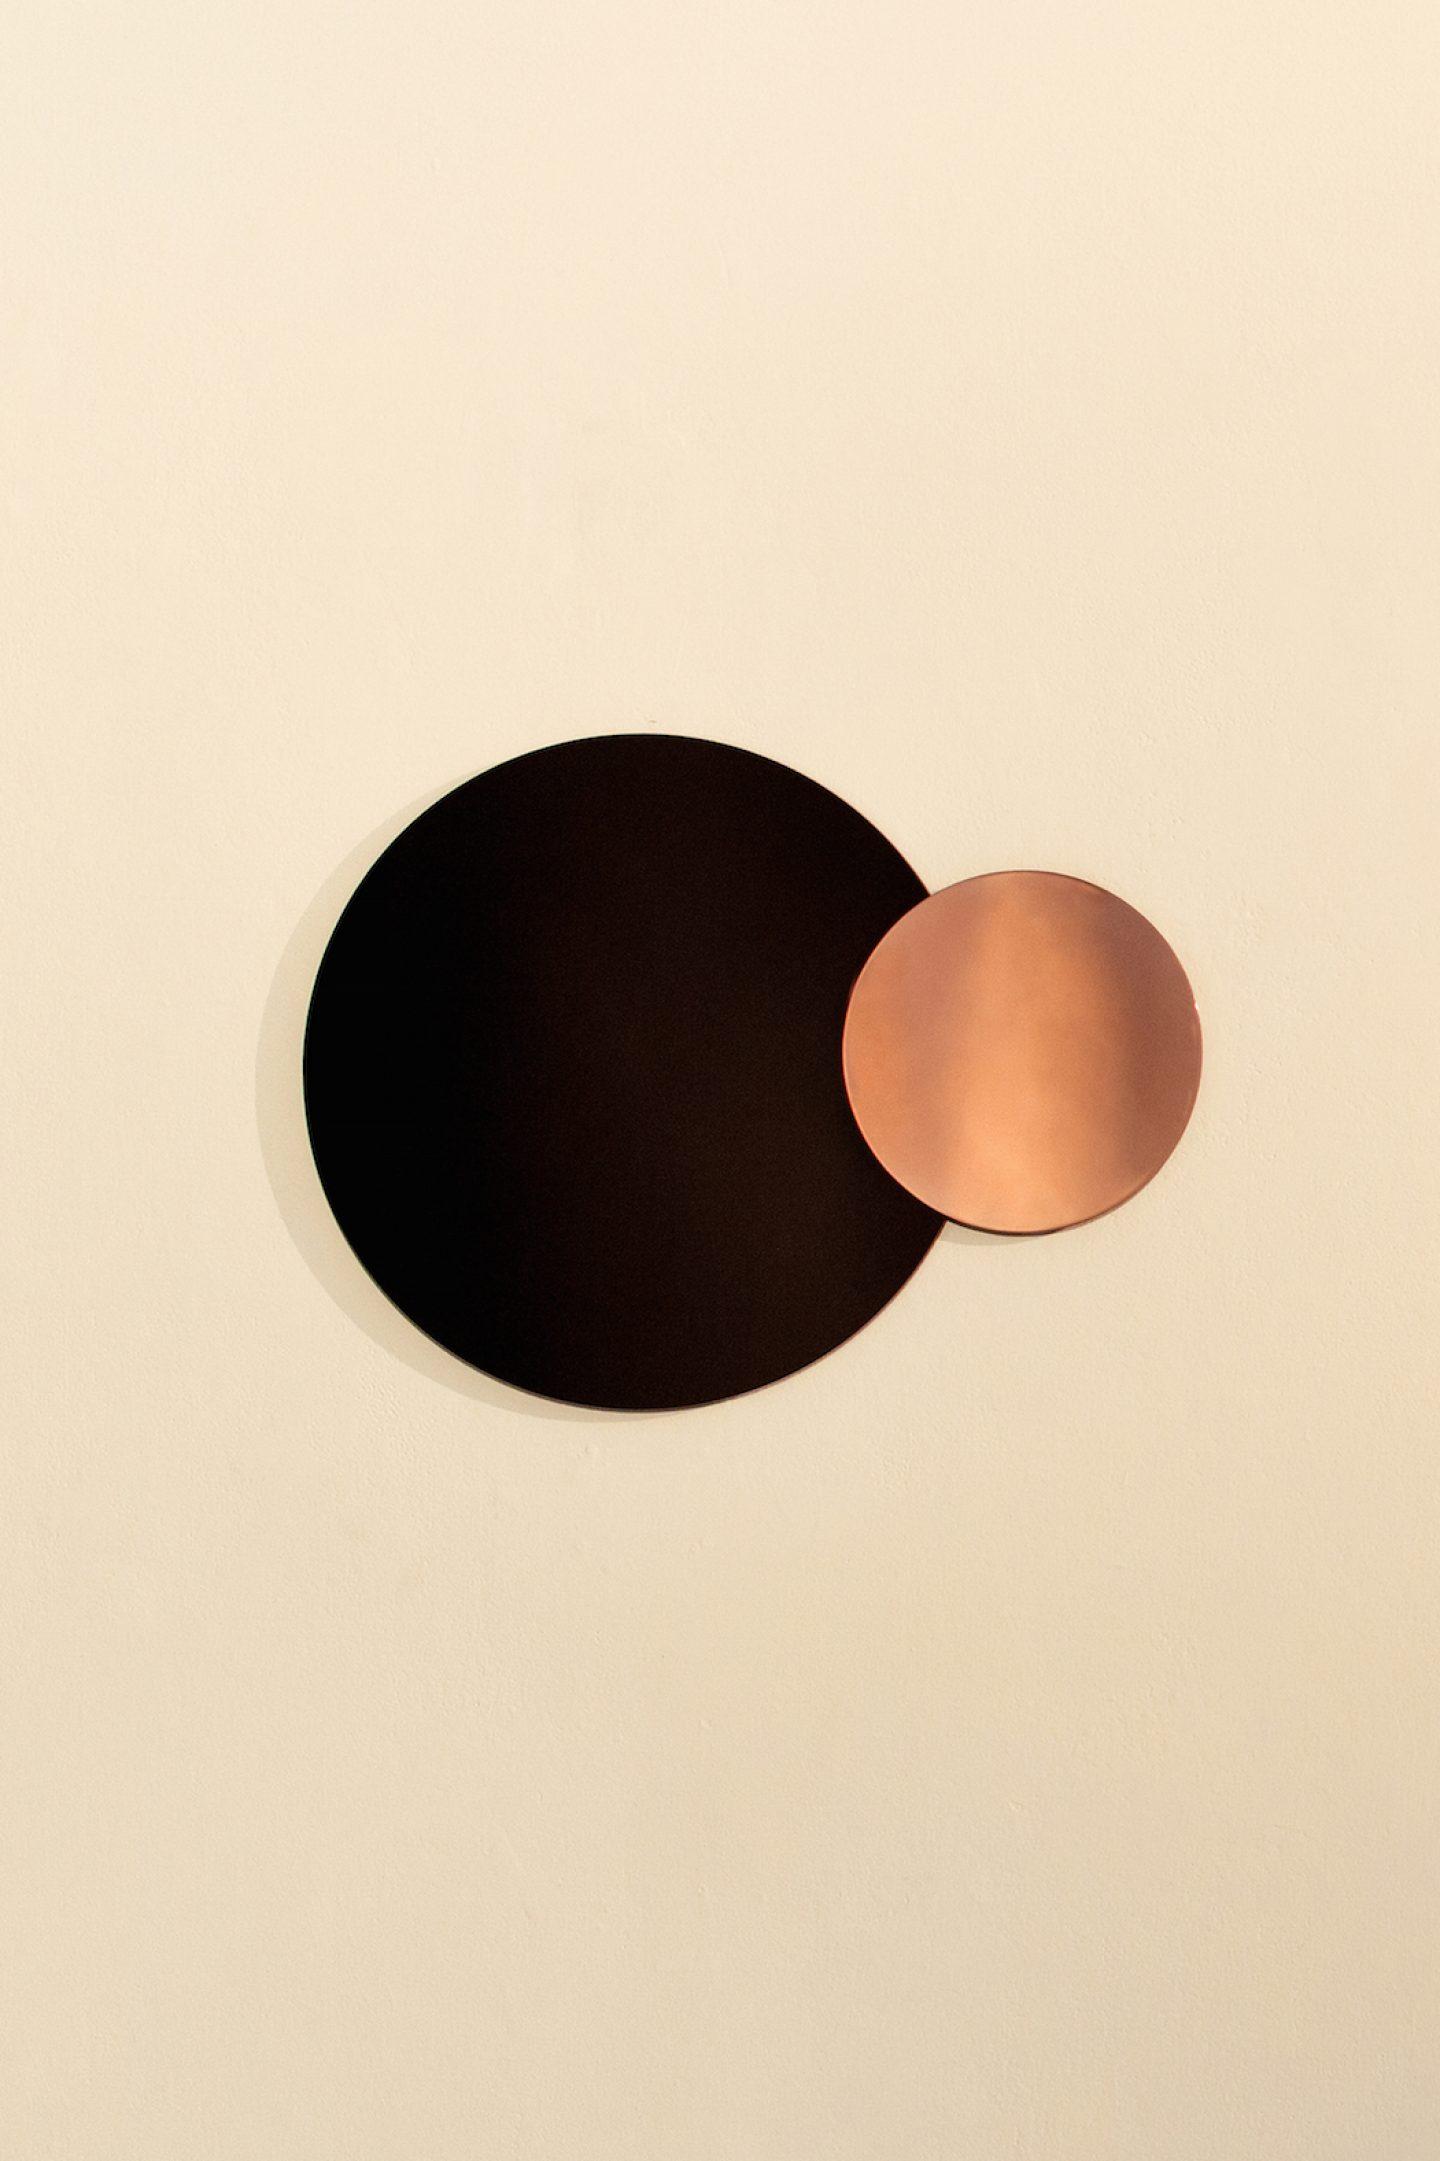 ninacho_design-Constructivist Mirror Series by Nina Cho 2